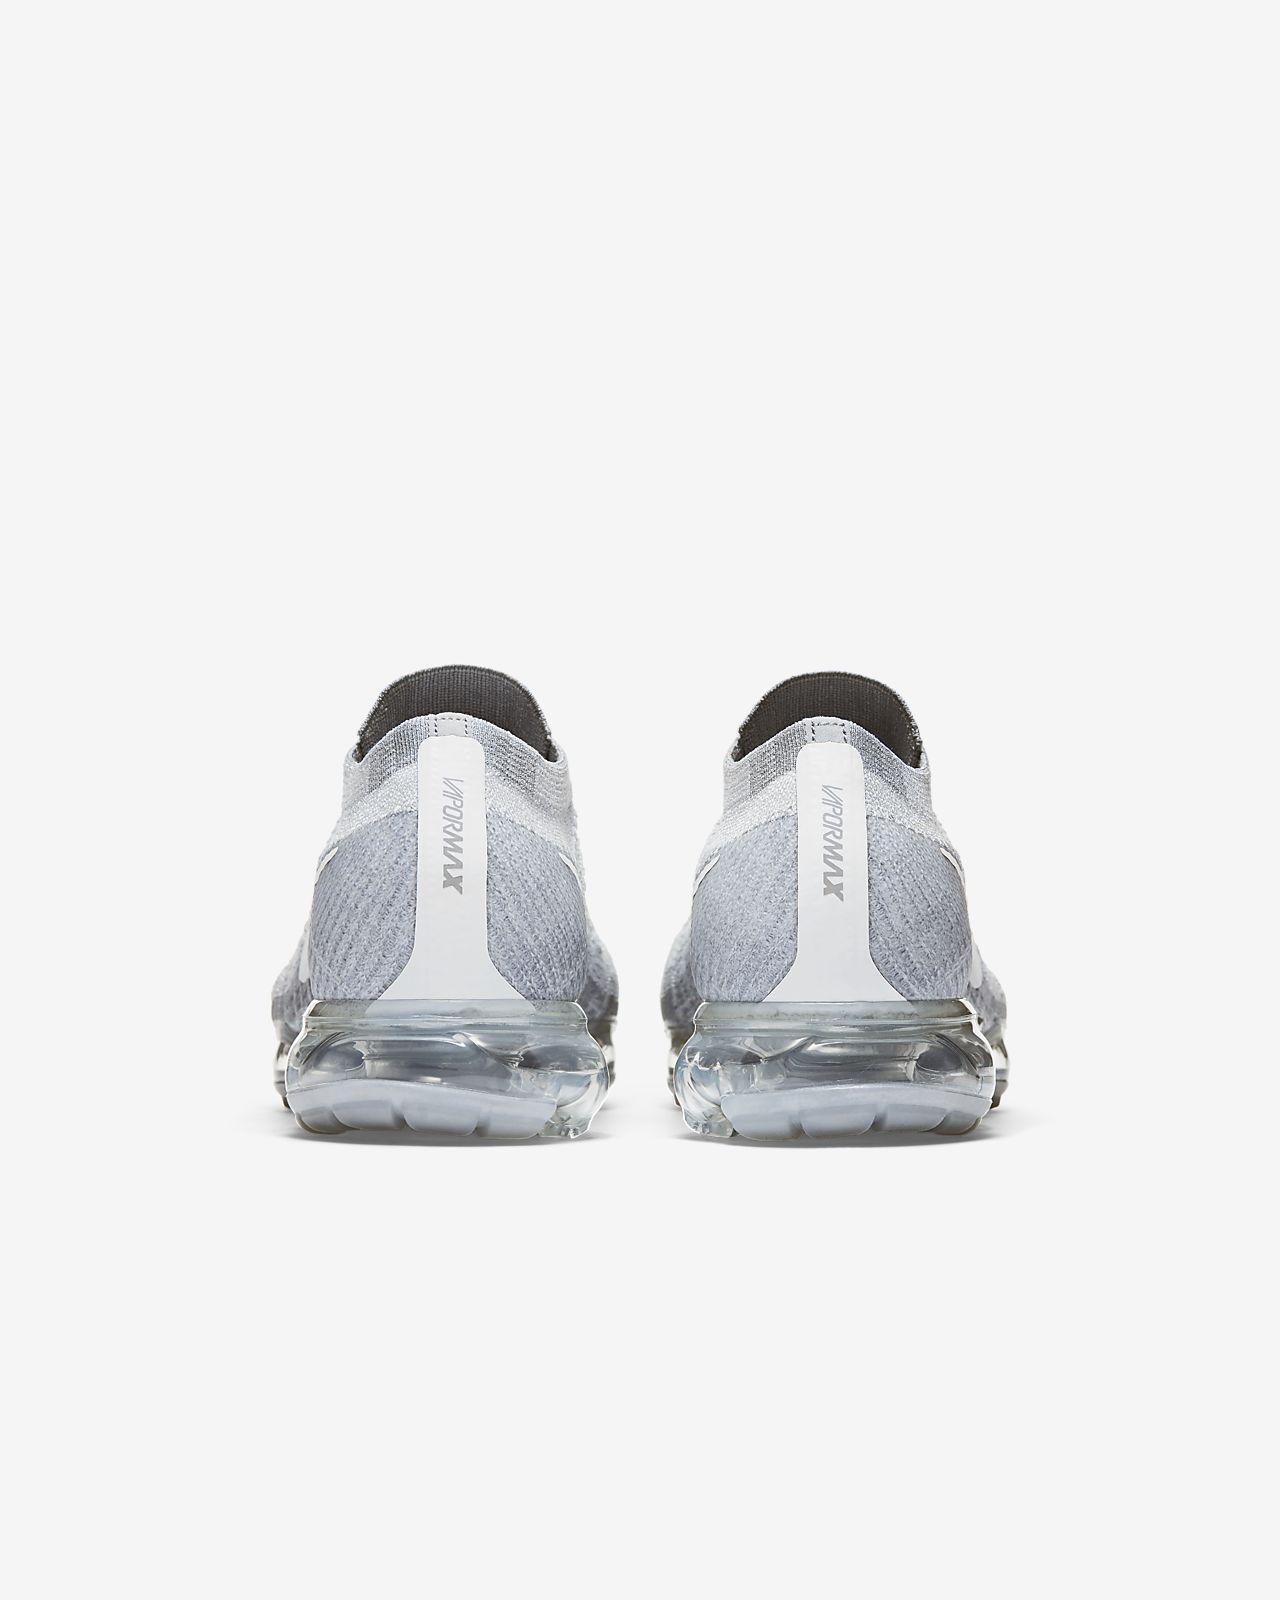 ... Nike Air VaporMax Flyknit Men's Running Shoe